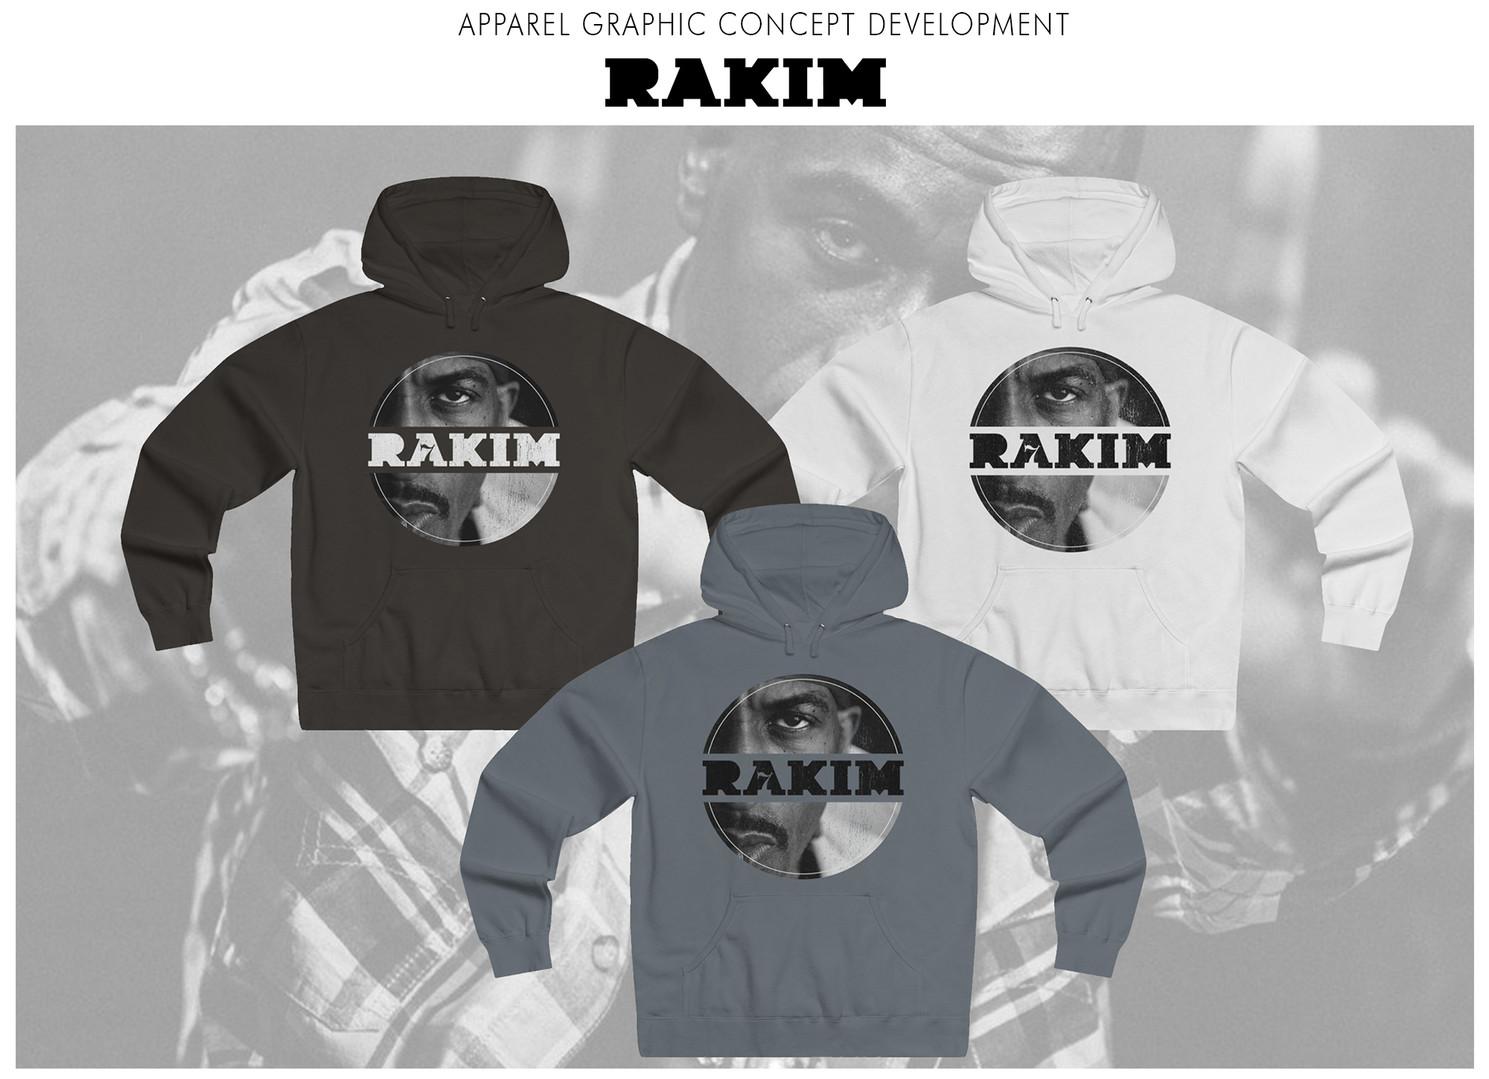 Apparel graphic concept development for recording artist Rakim.